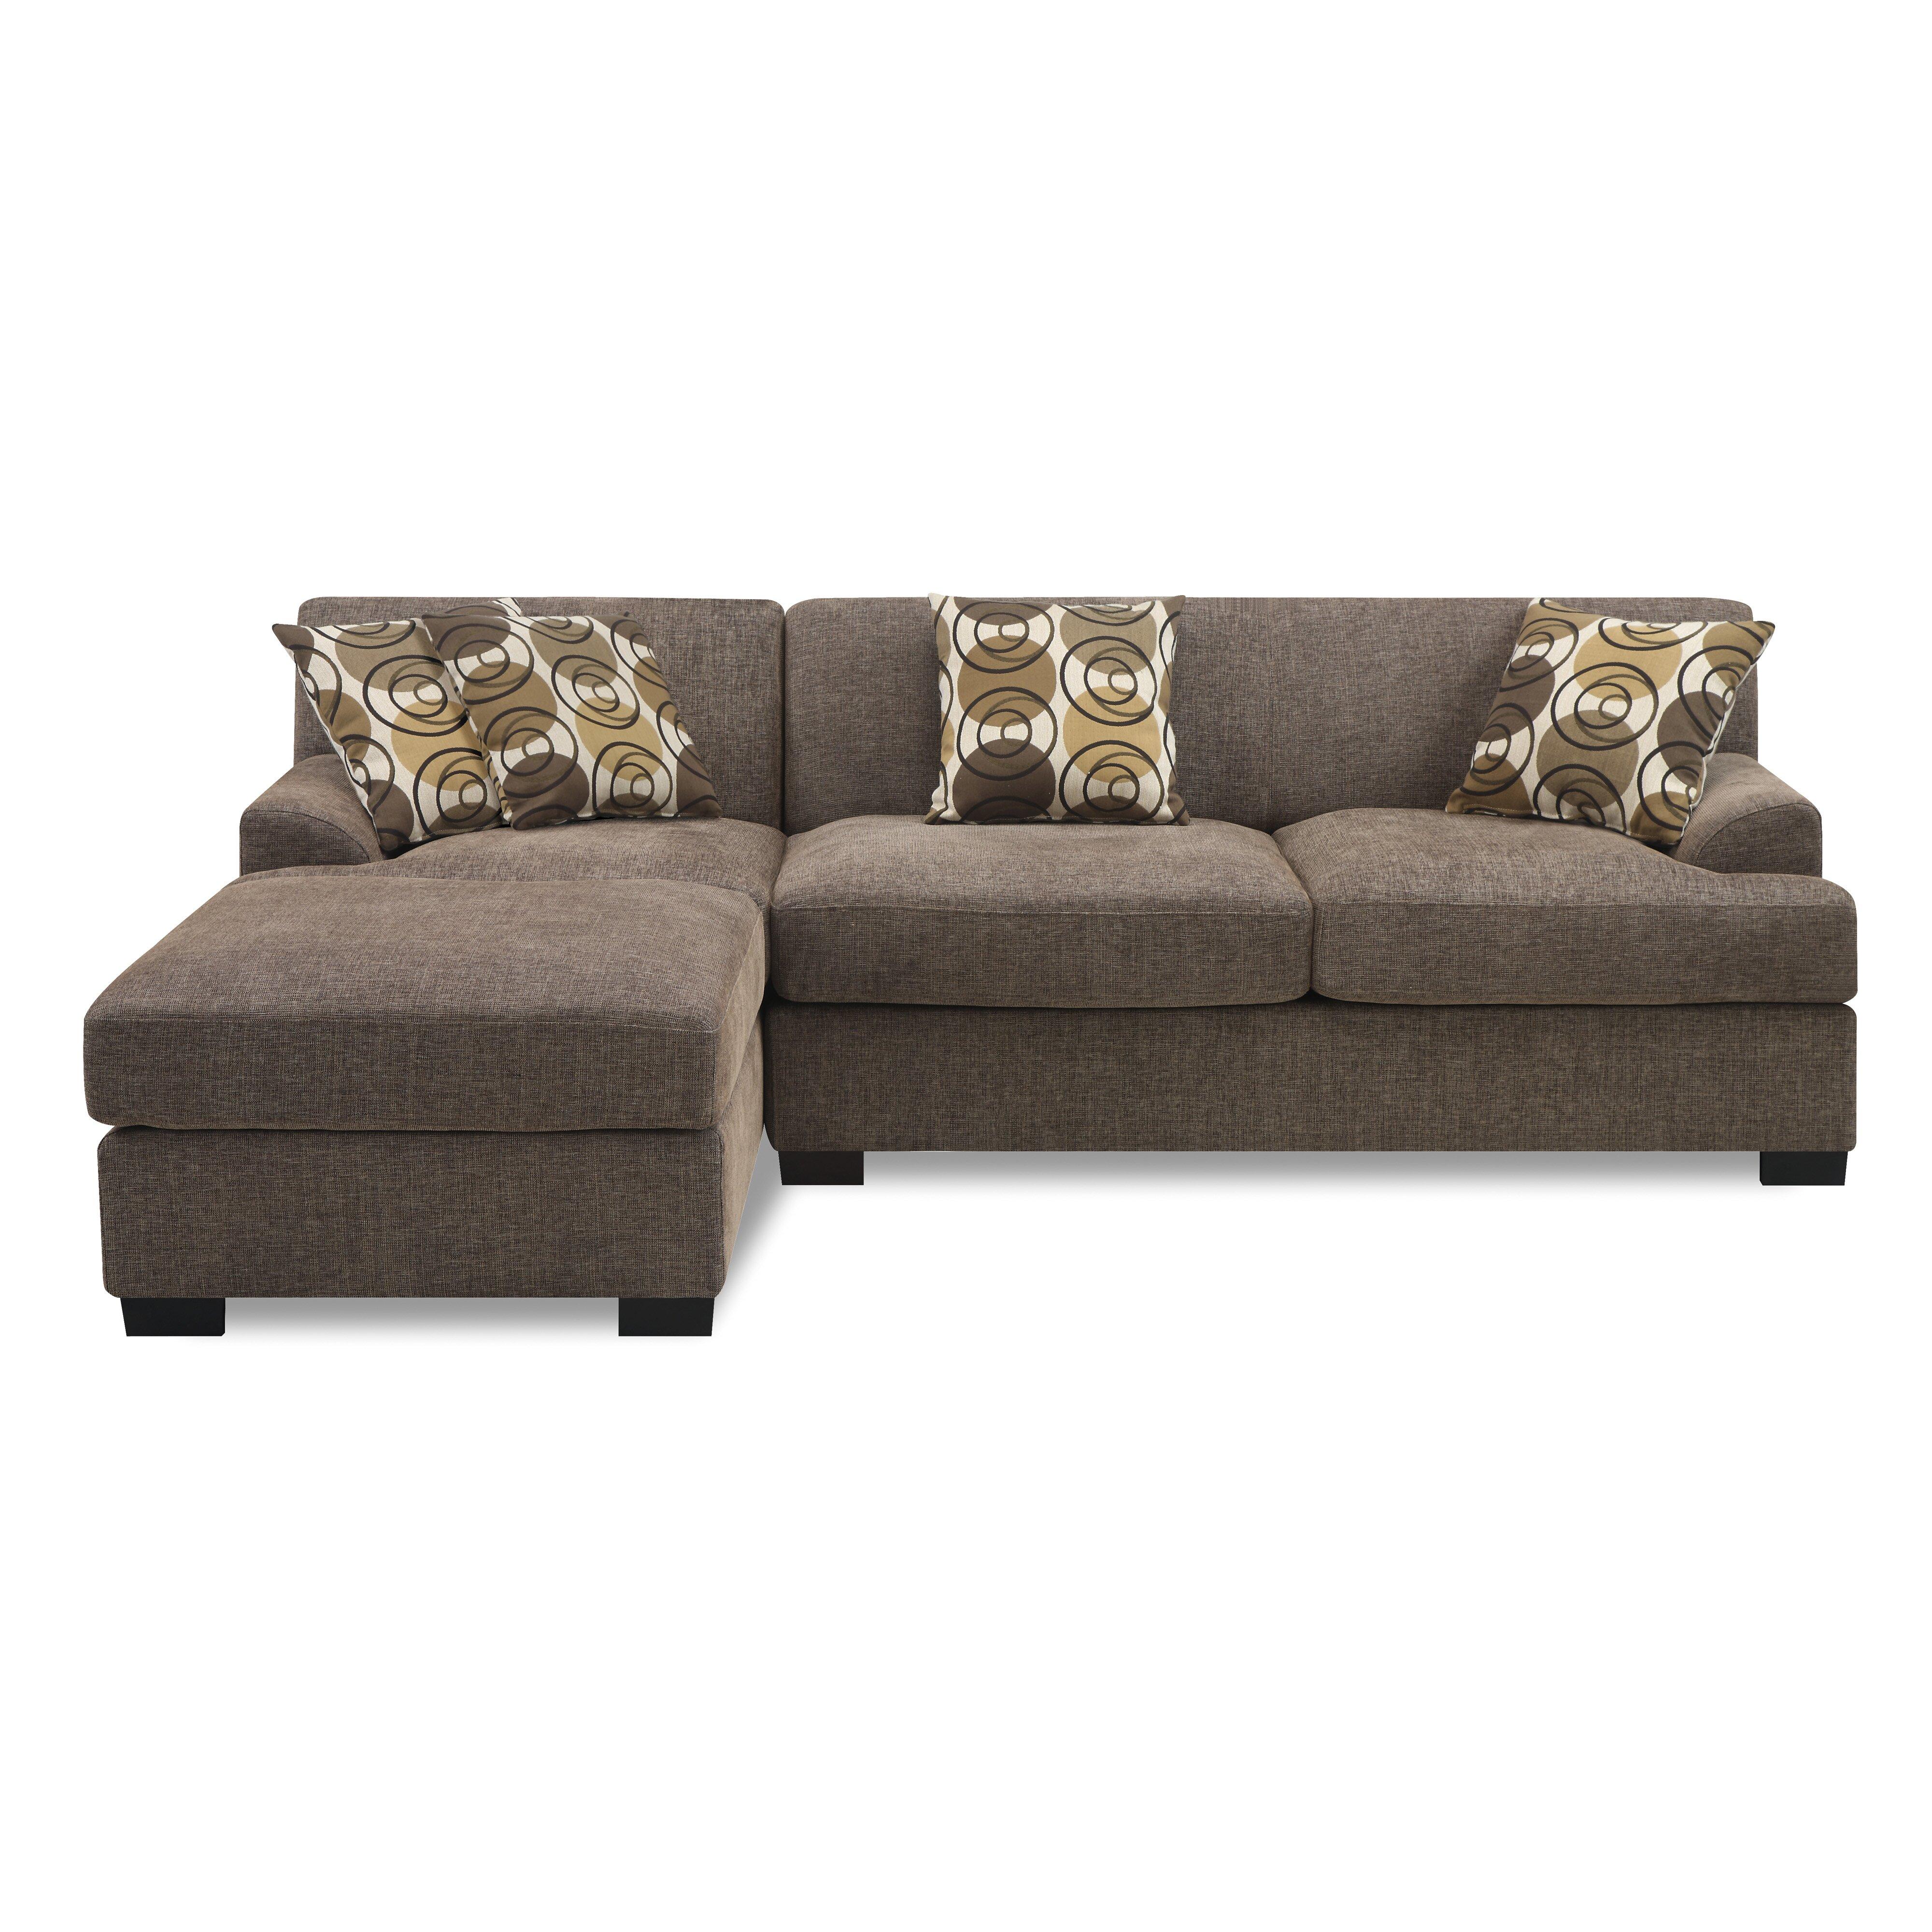 Sectional Sofa Sale Montreal: Poundex Montréal Reversible Chaise Sectional & Reviews